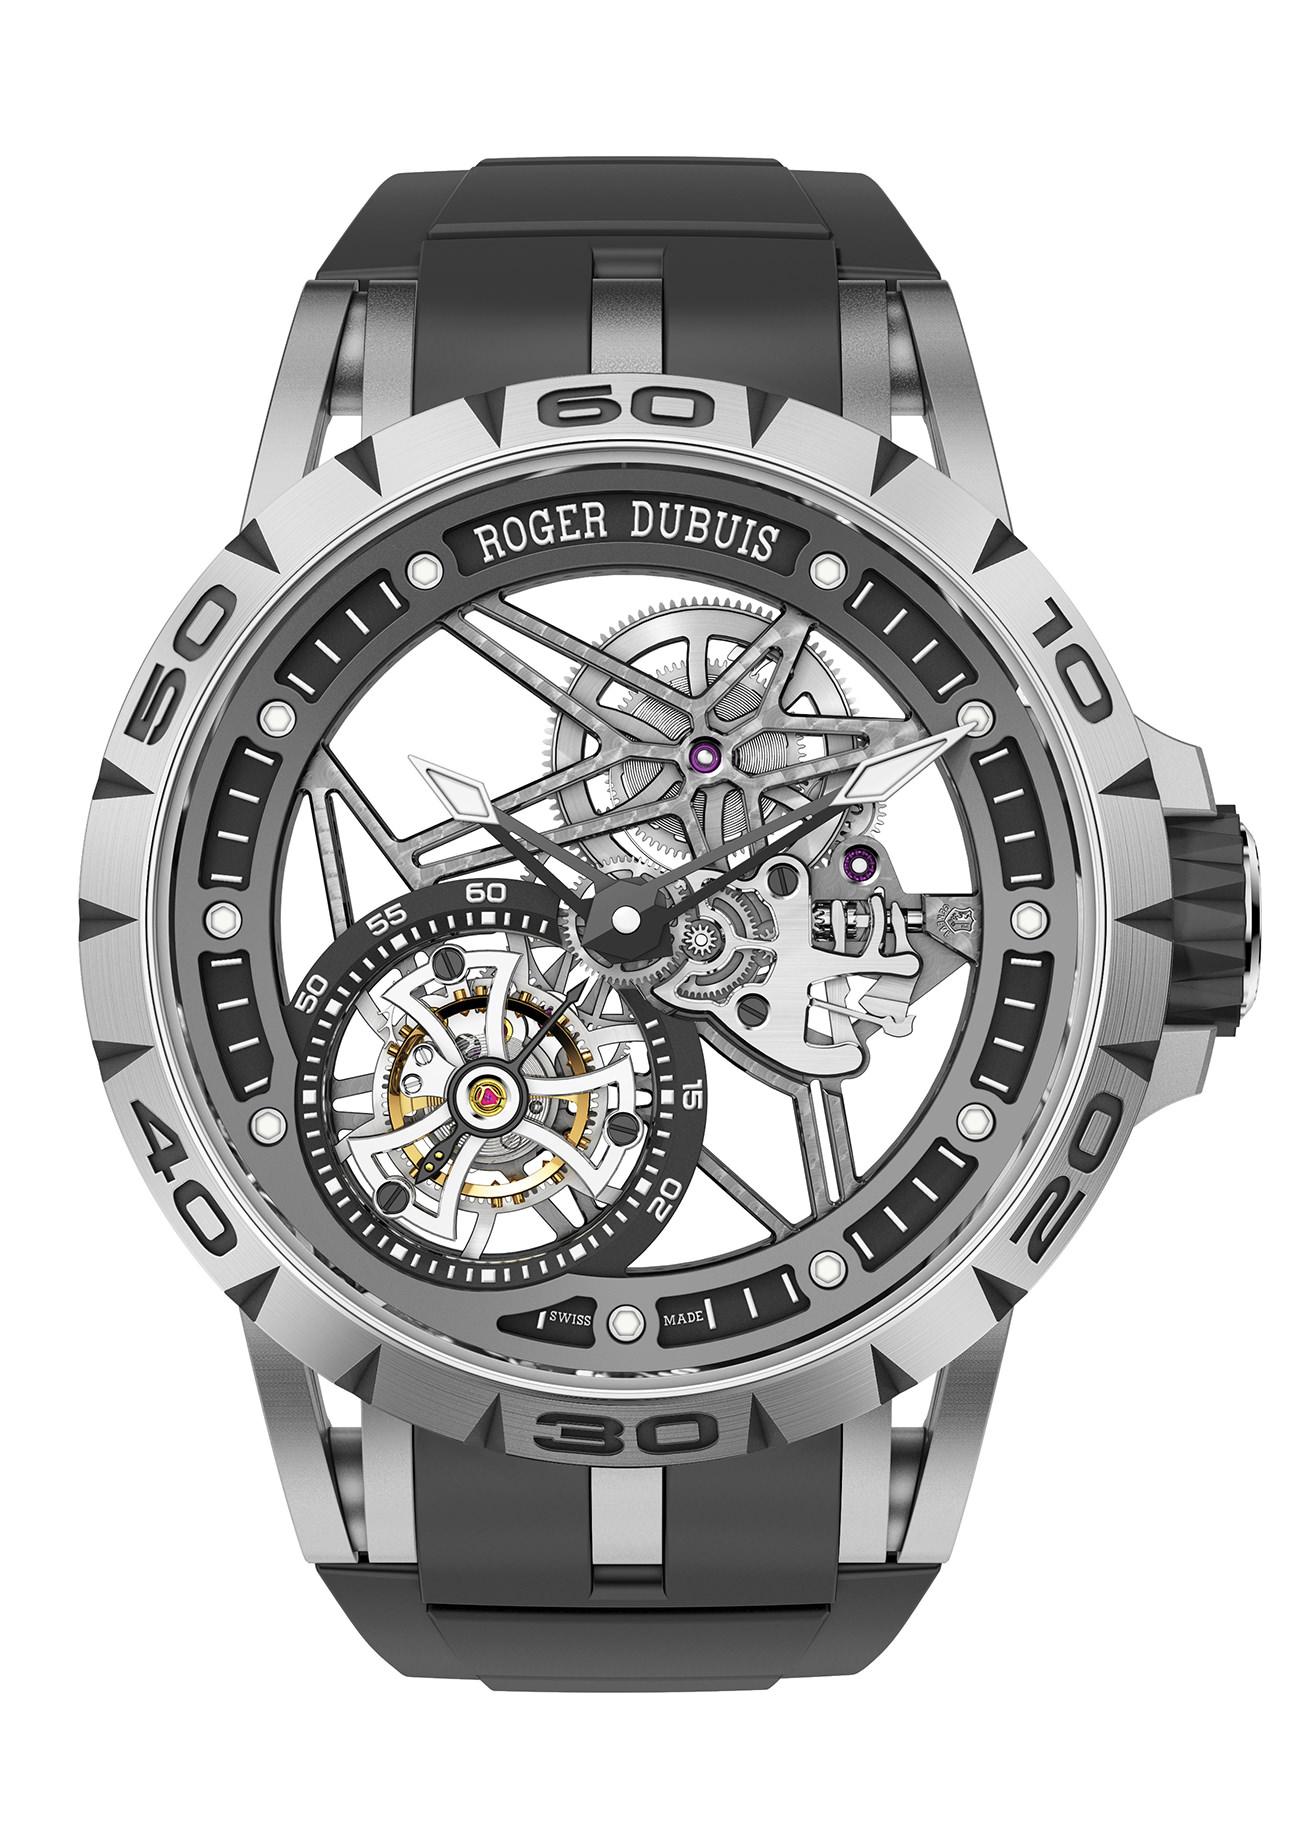 Roger-Dubuis-Excalibur-Spider-Skeleton-Flying-Tourbillon-3